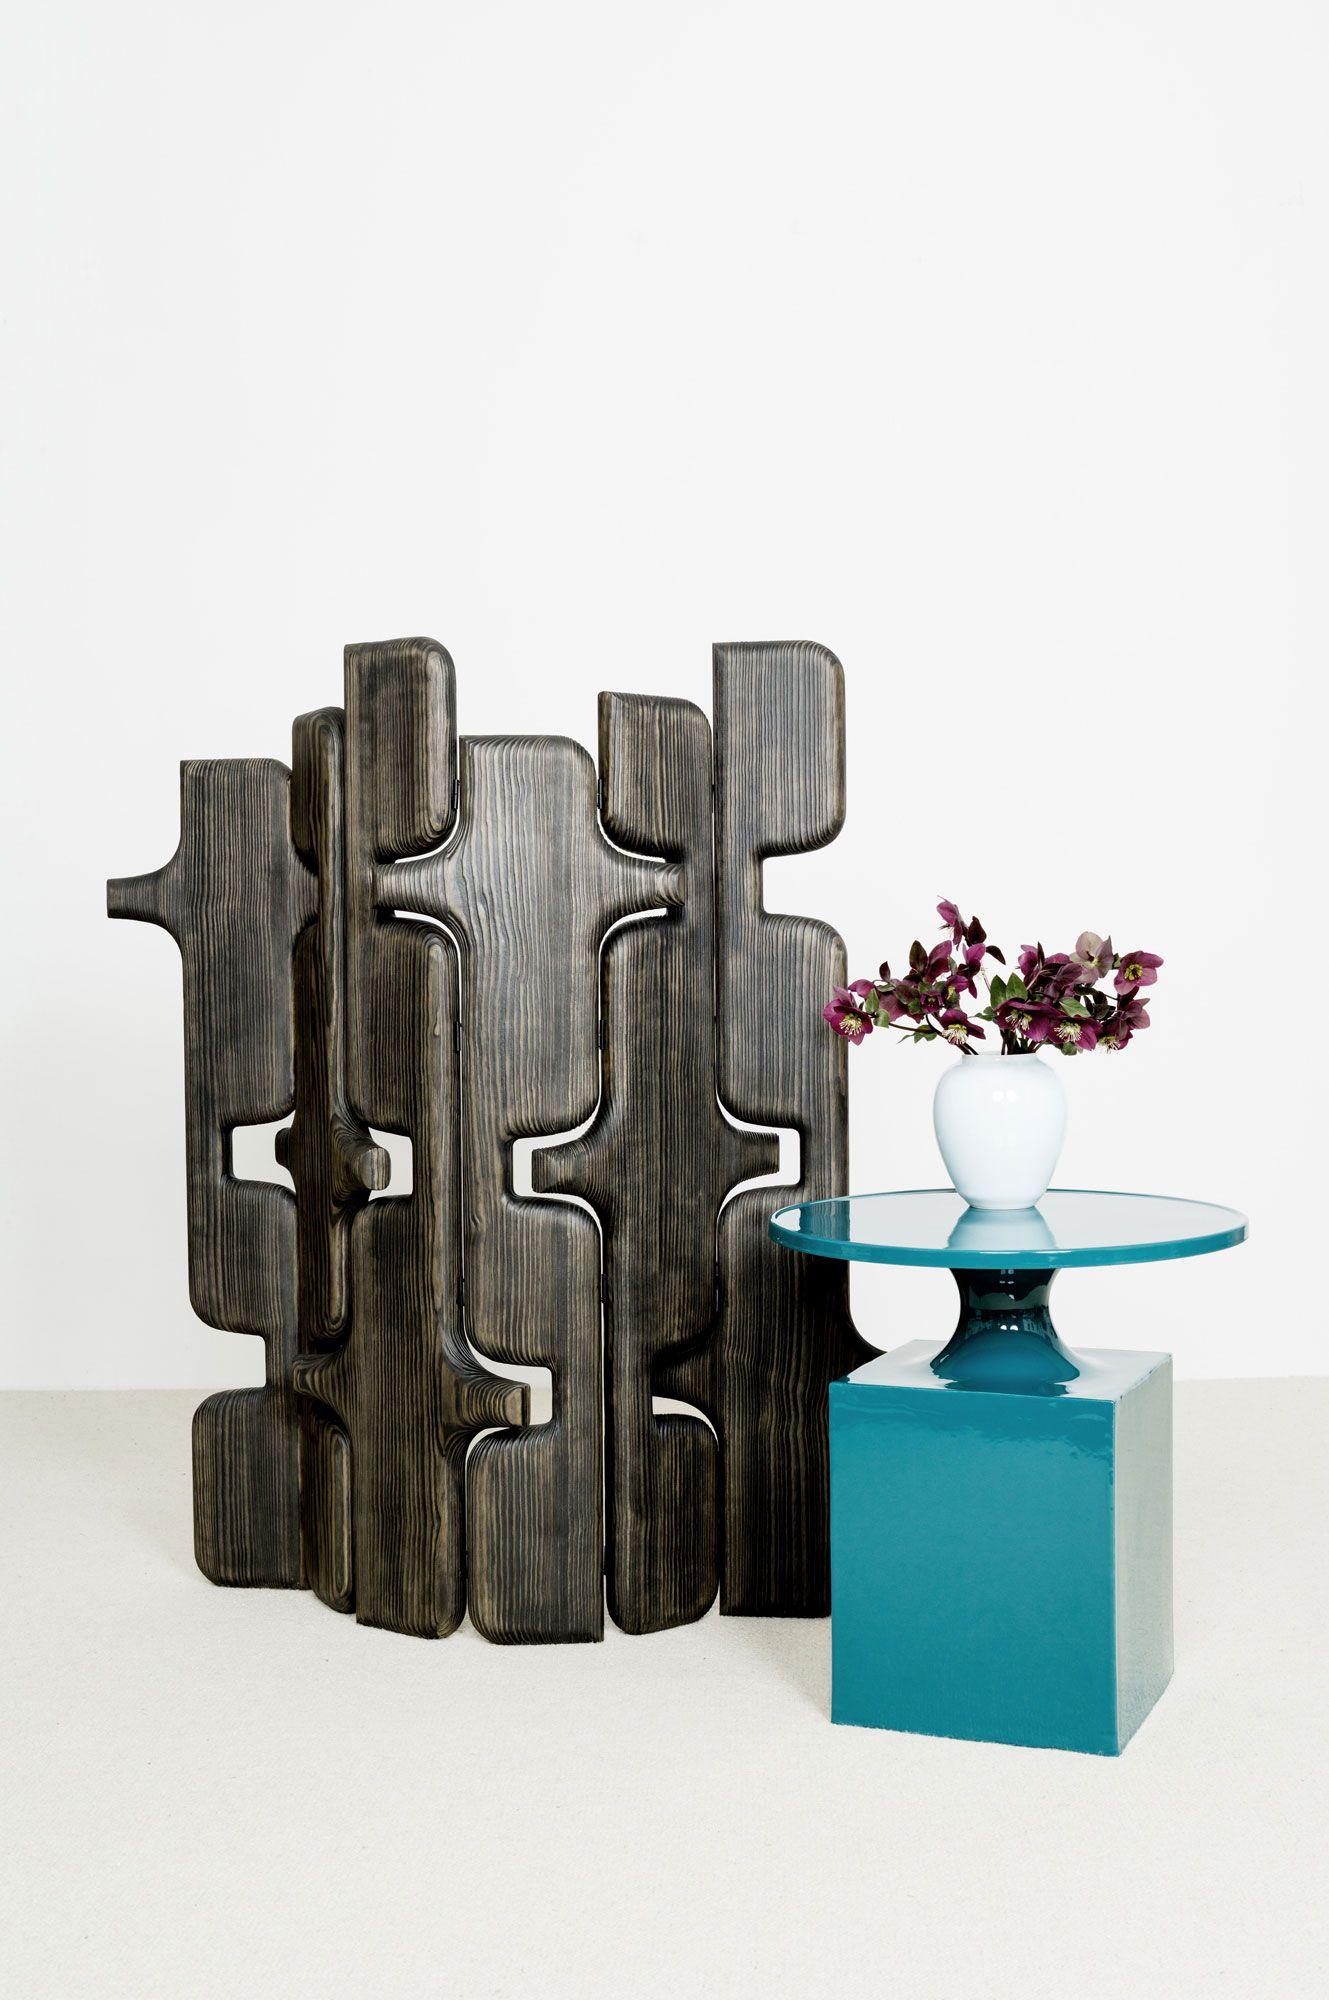 e81ffa84c1ca2b69e900b7844733d41d Incroyable De Table Basse Le Corbusier Concept